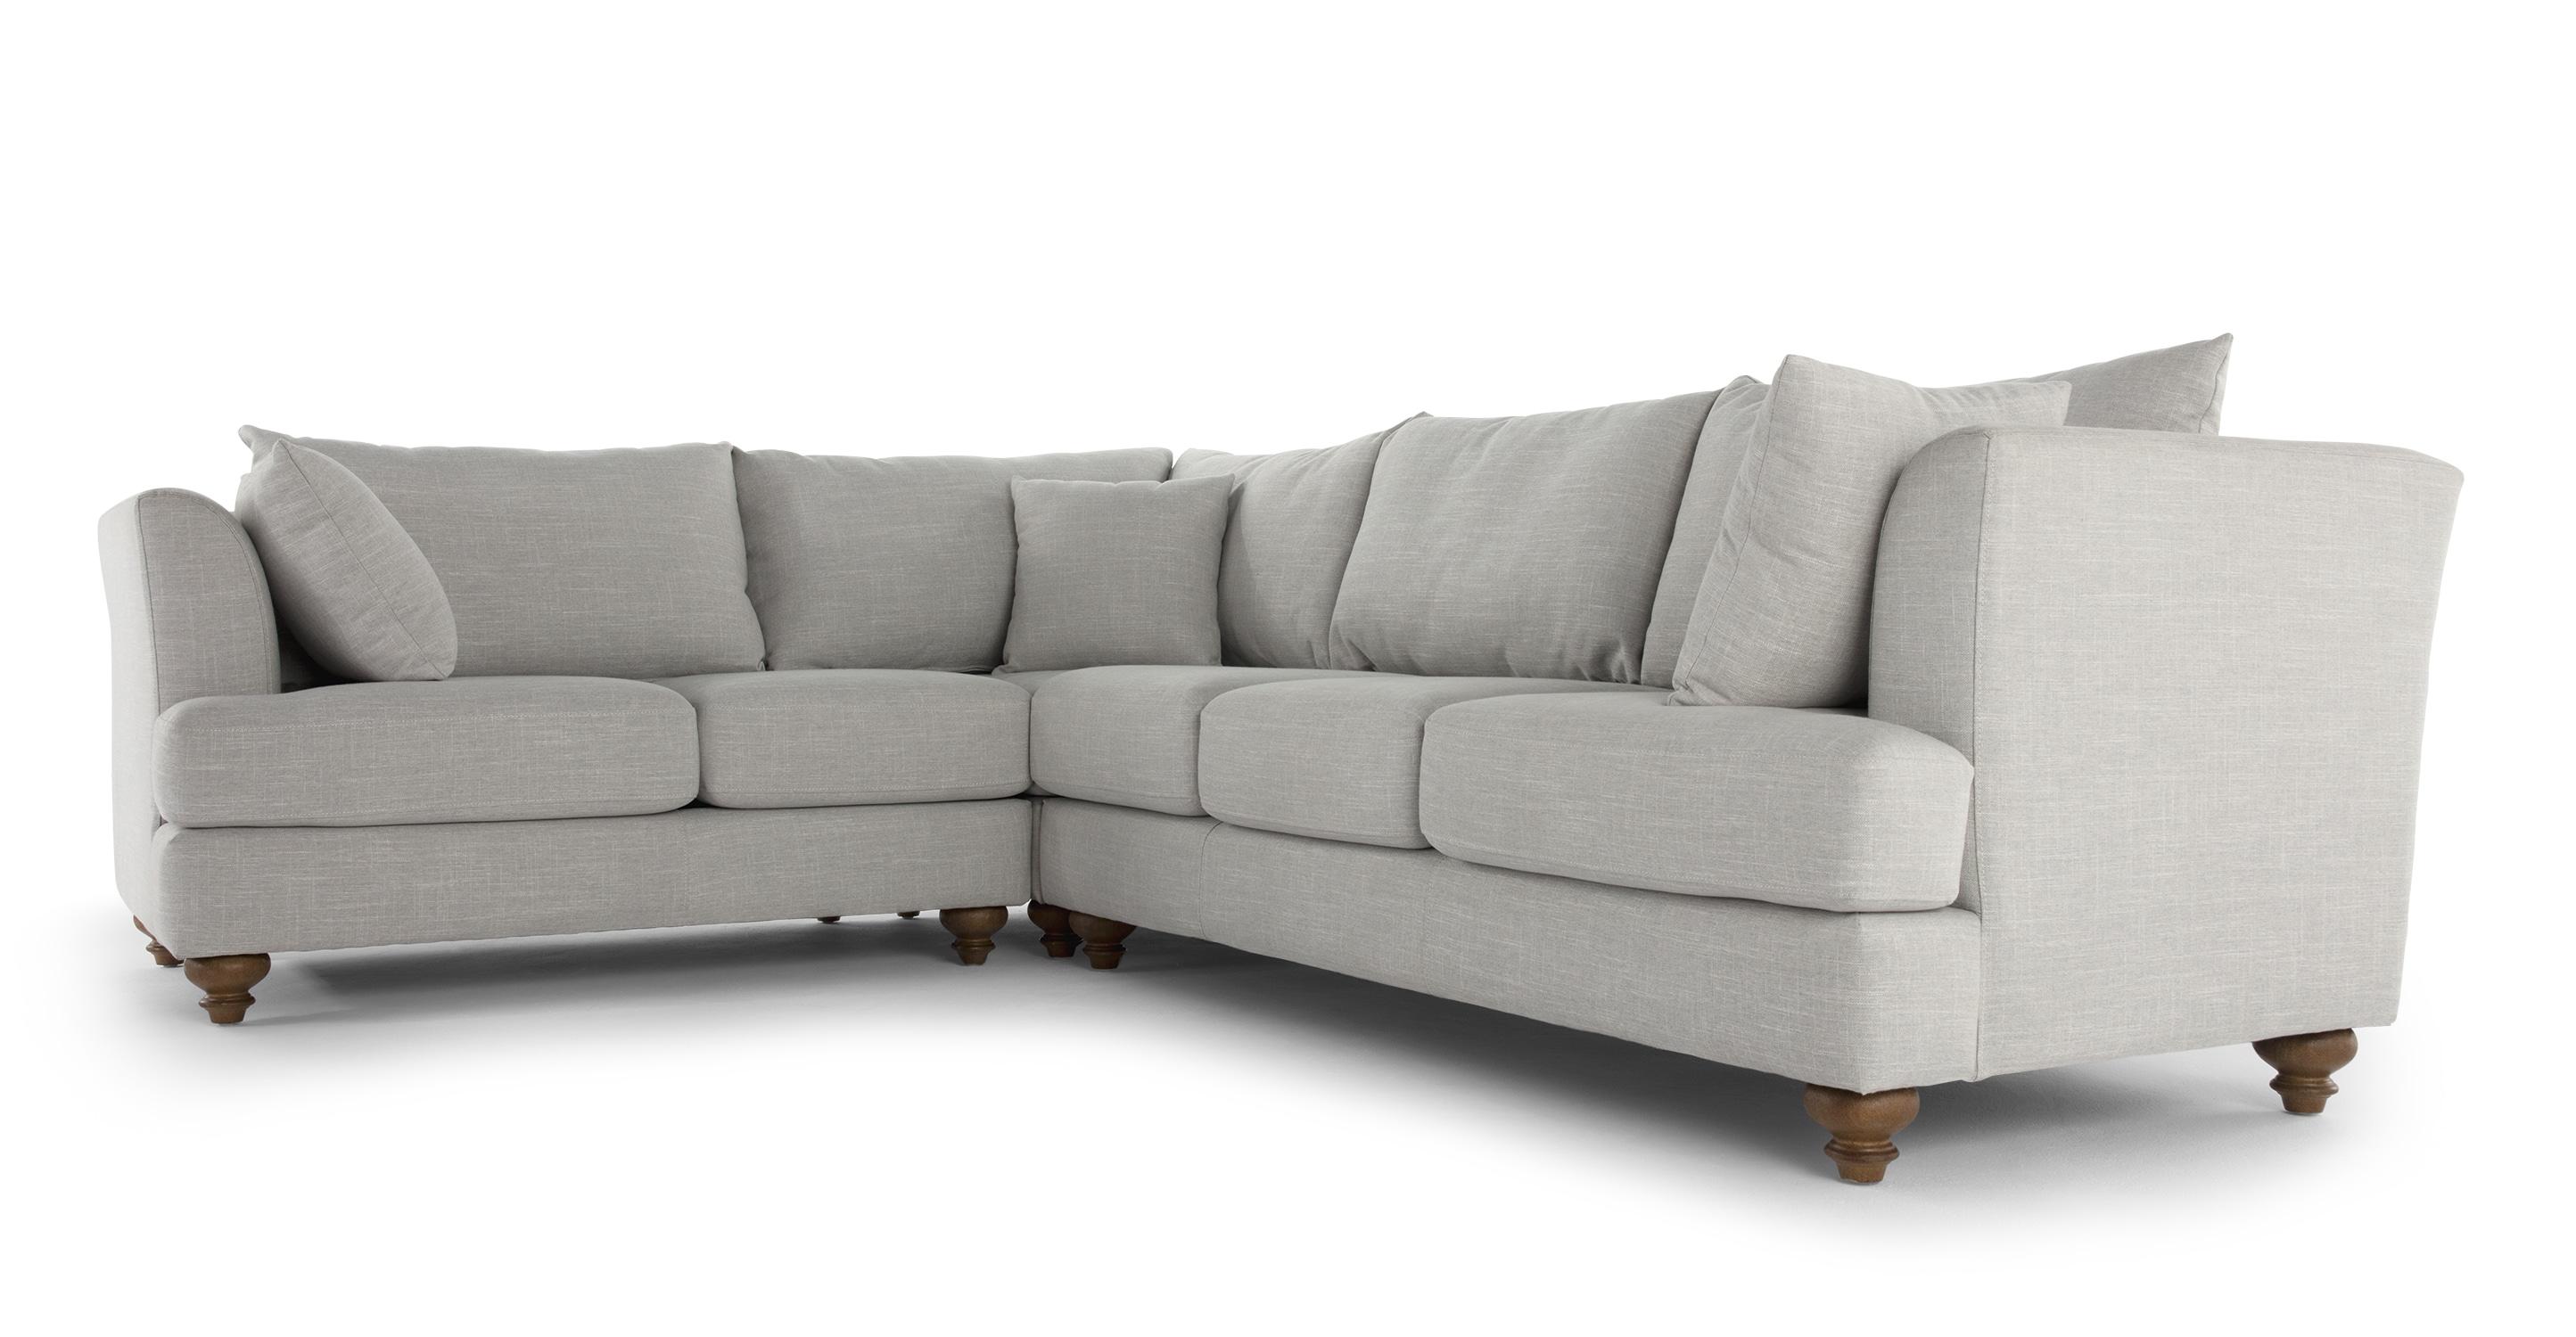 chic sofas uk sofa bed target elliot corner grey mysmallspace